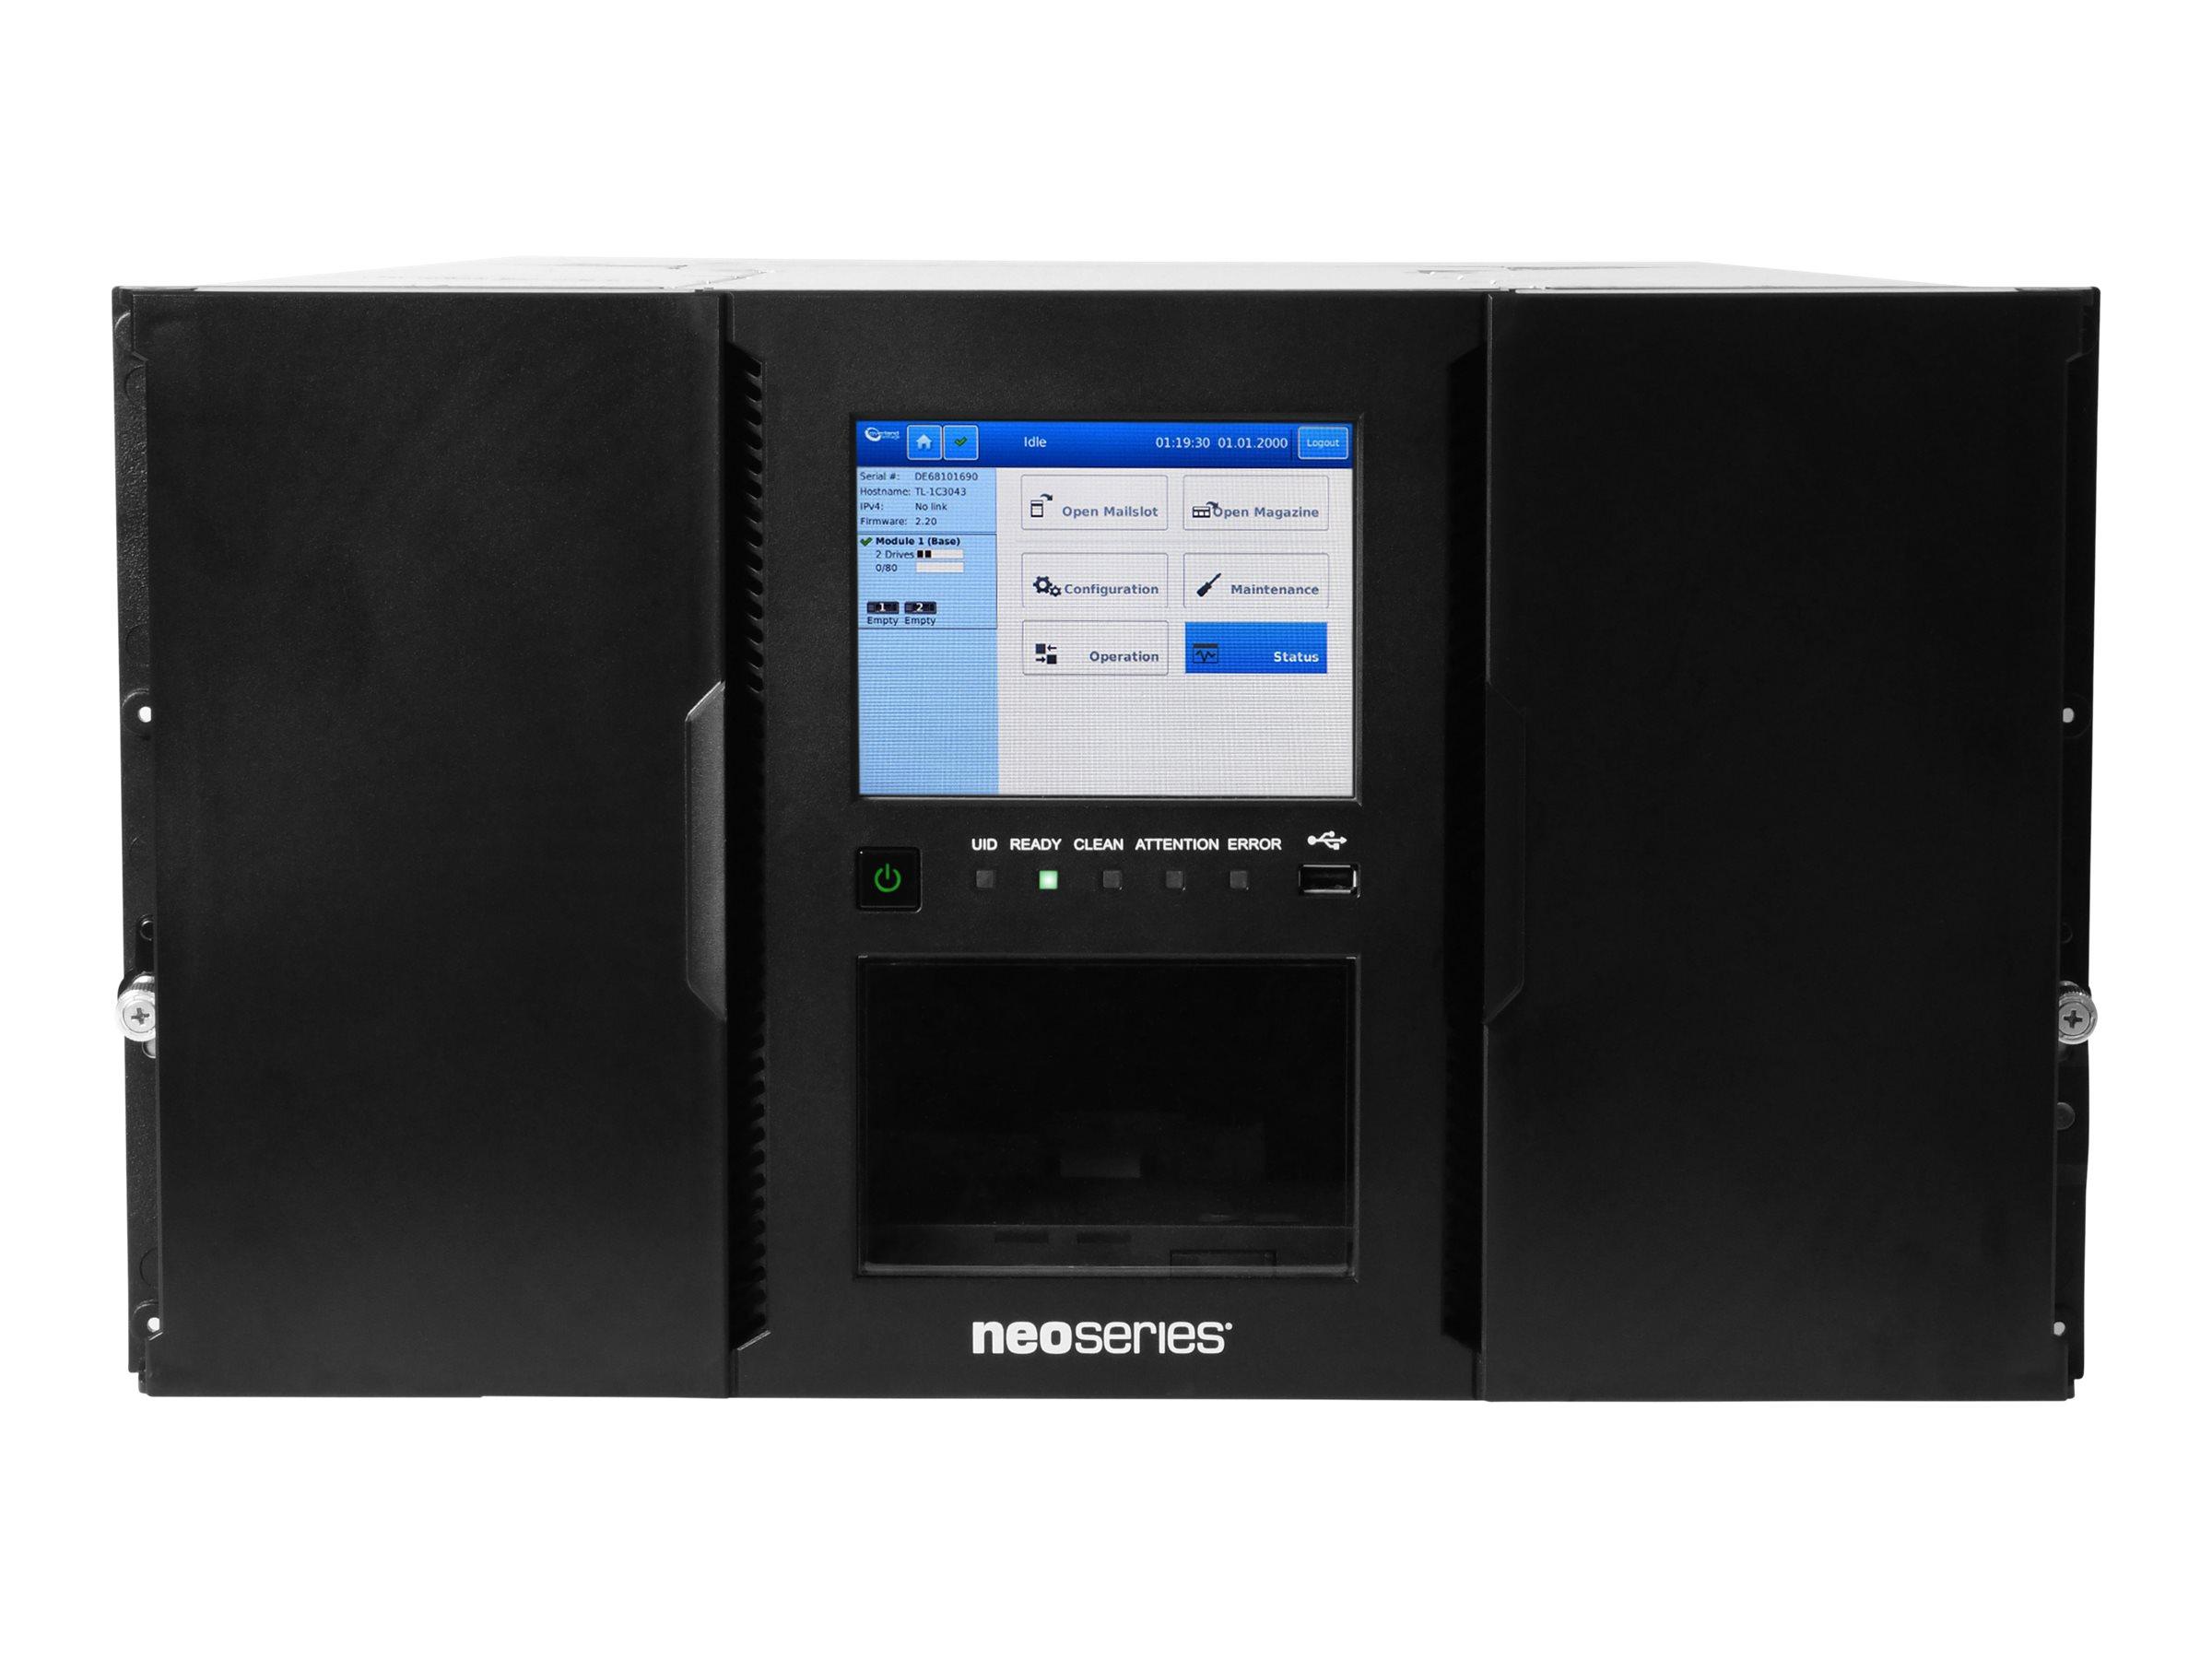 Overland-Tandberg NEOxl 80 - Bandbibliothek - 200 TB / 500 TB - Steckplätze: 80 - LTO Ultrium (2 TB / 5 TB)